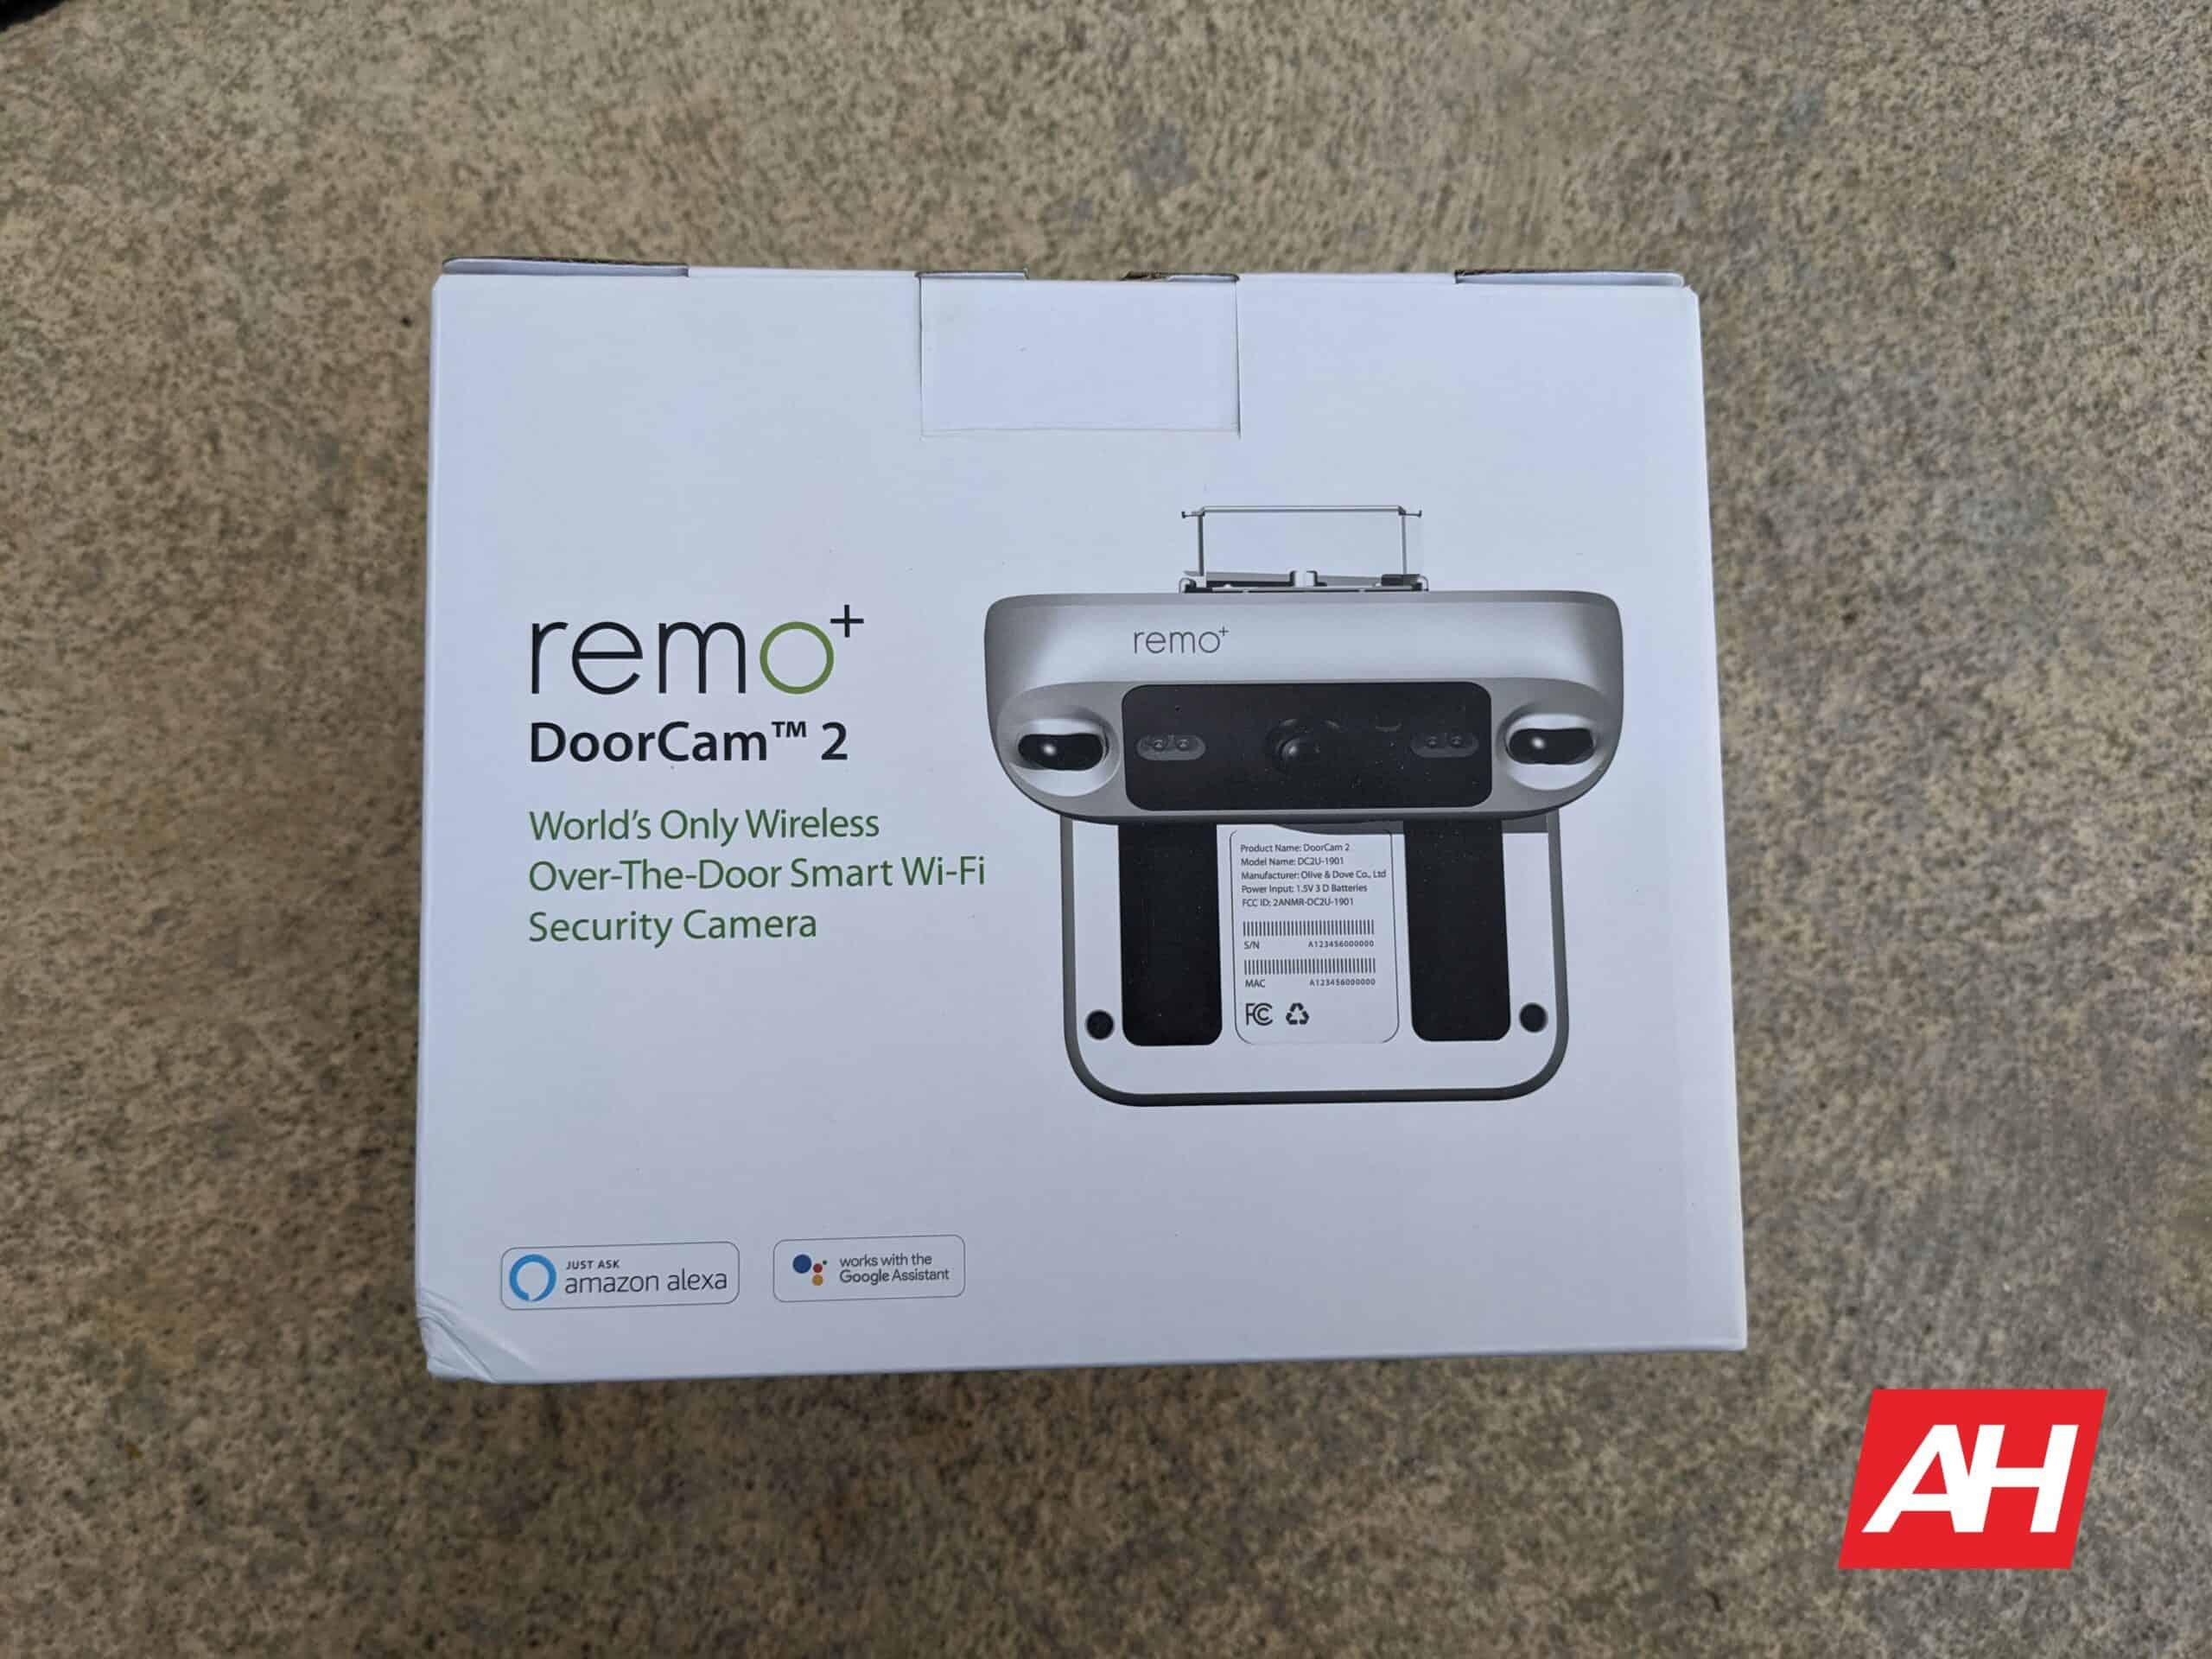 DoorCam2 HR AH Box1